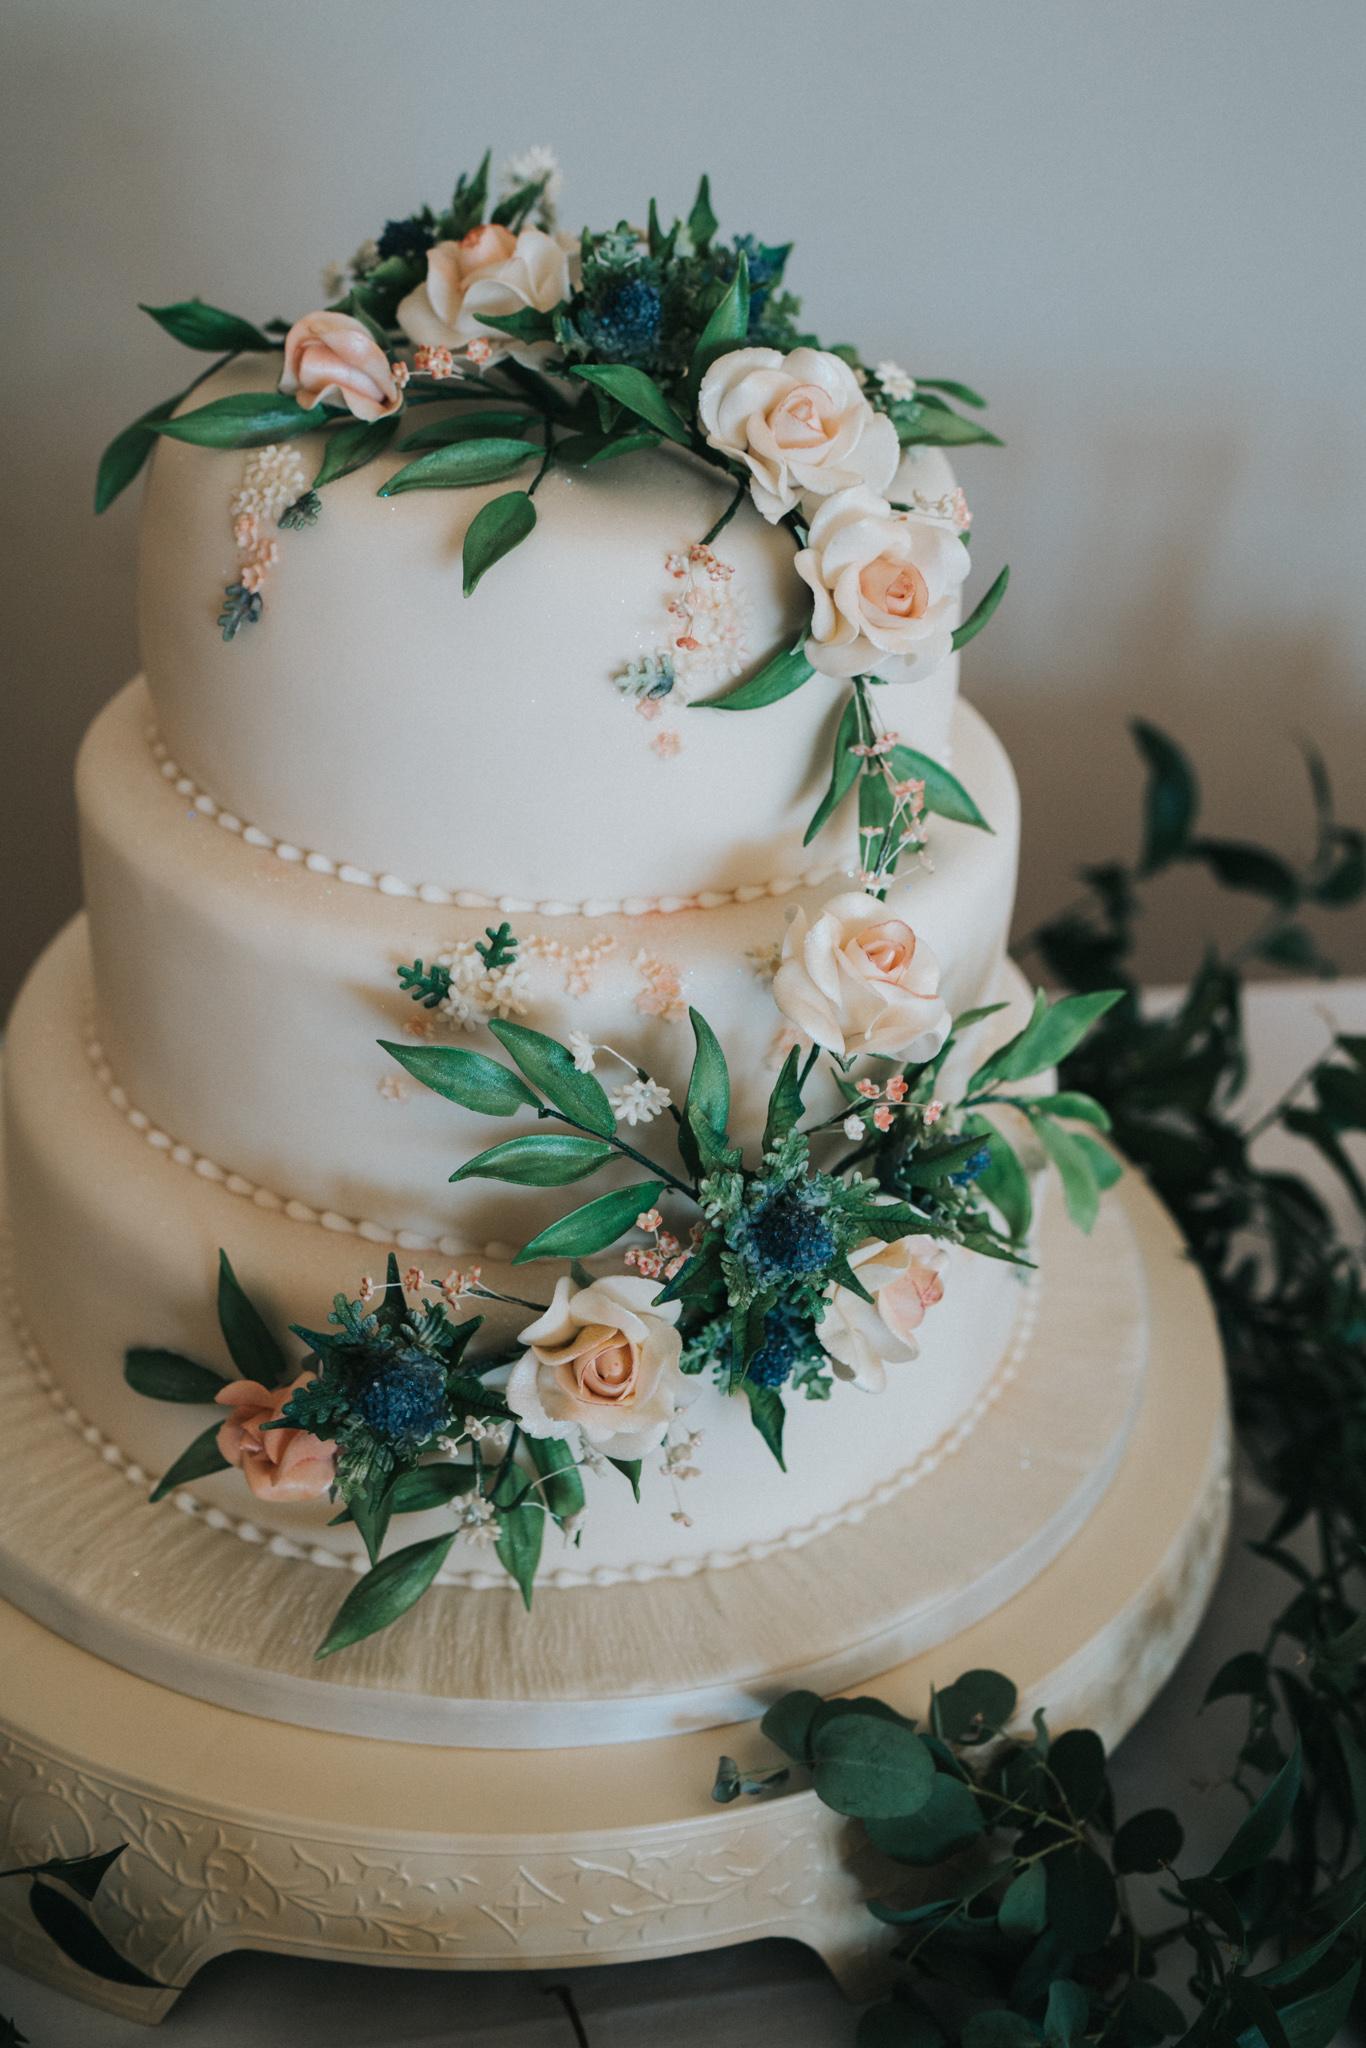 Jess-and-Tom-Norfolk-Alternative-Wedding-Essex-Wedding-Photographer-Grace-Elizabeth-16.jpg